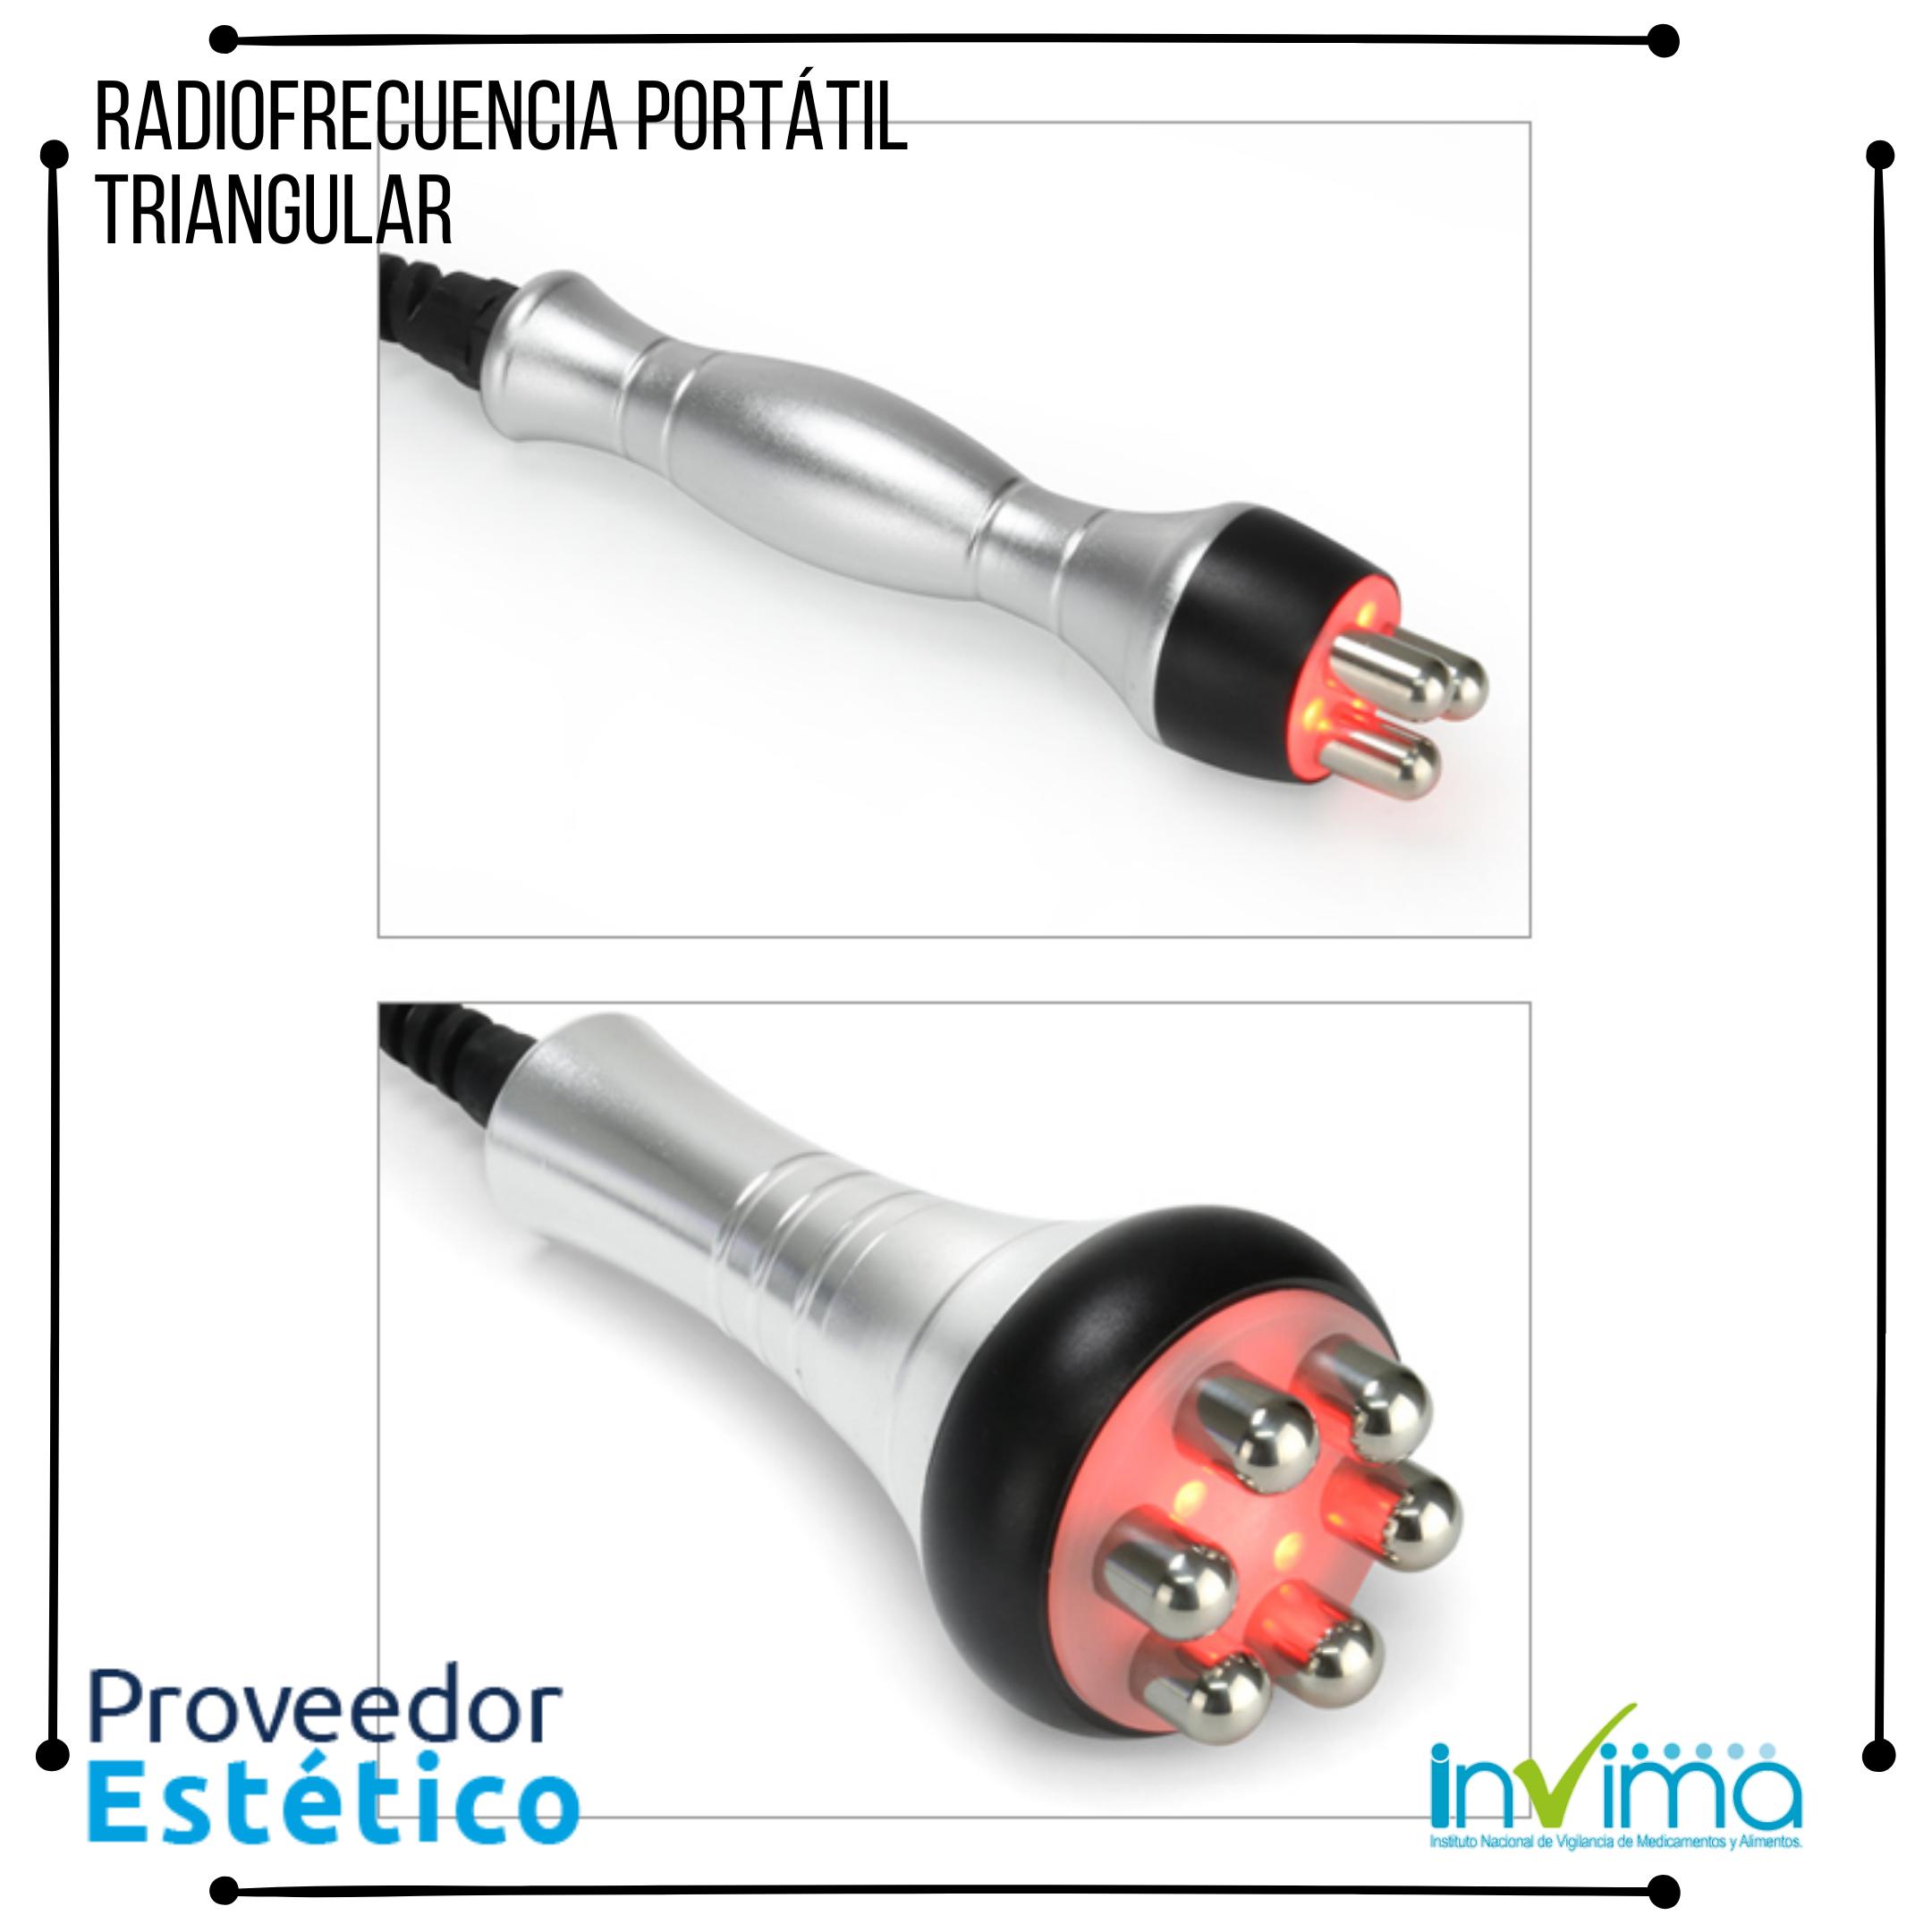 https://0201.nccdn.net/1_2/000/000/131/ba7/radiofrecuencia-port--til-triangular--3-.png